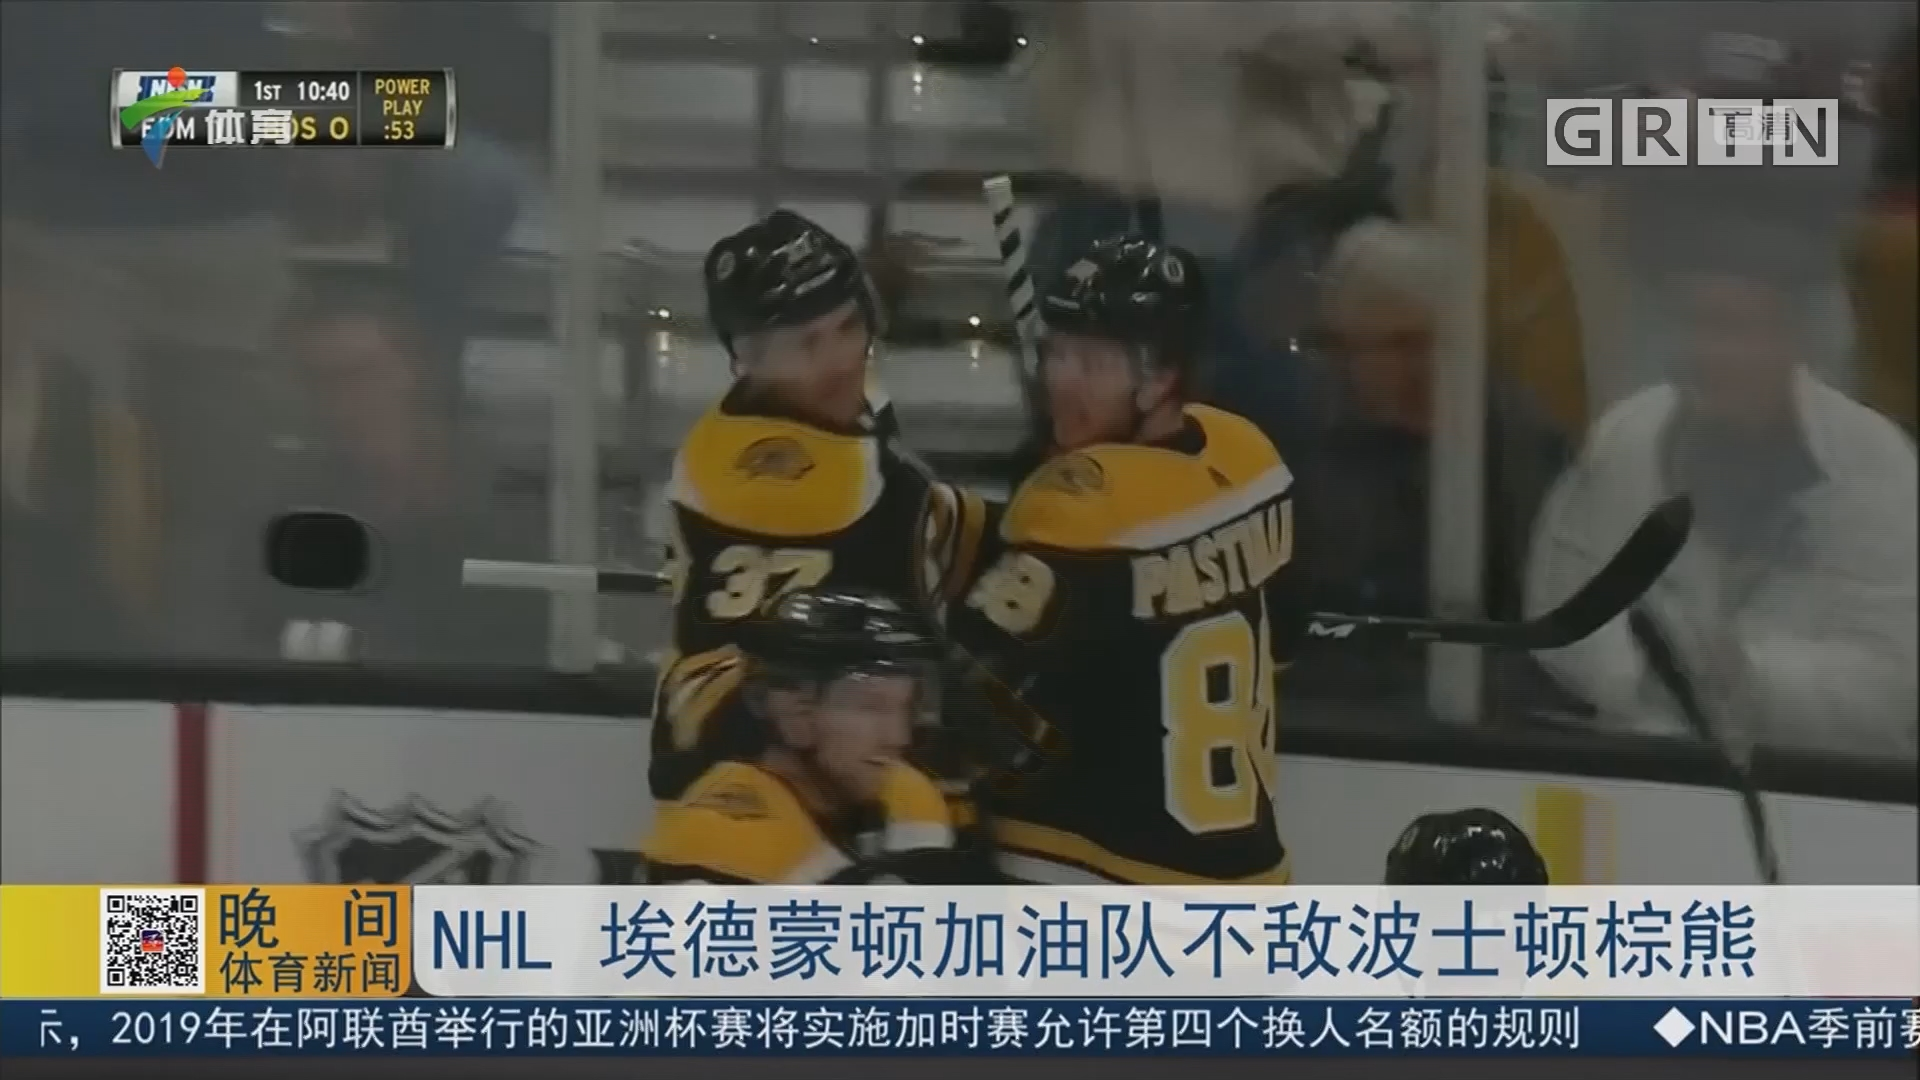 NHL 埃德蒙顿加油队不敌波士顿棕熊